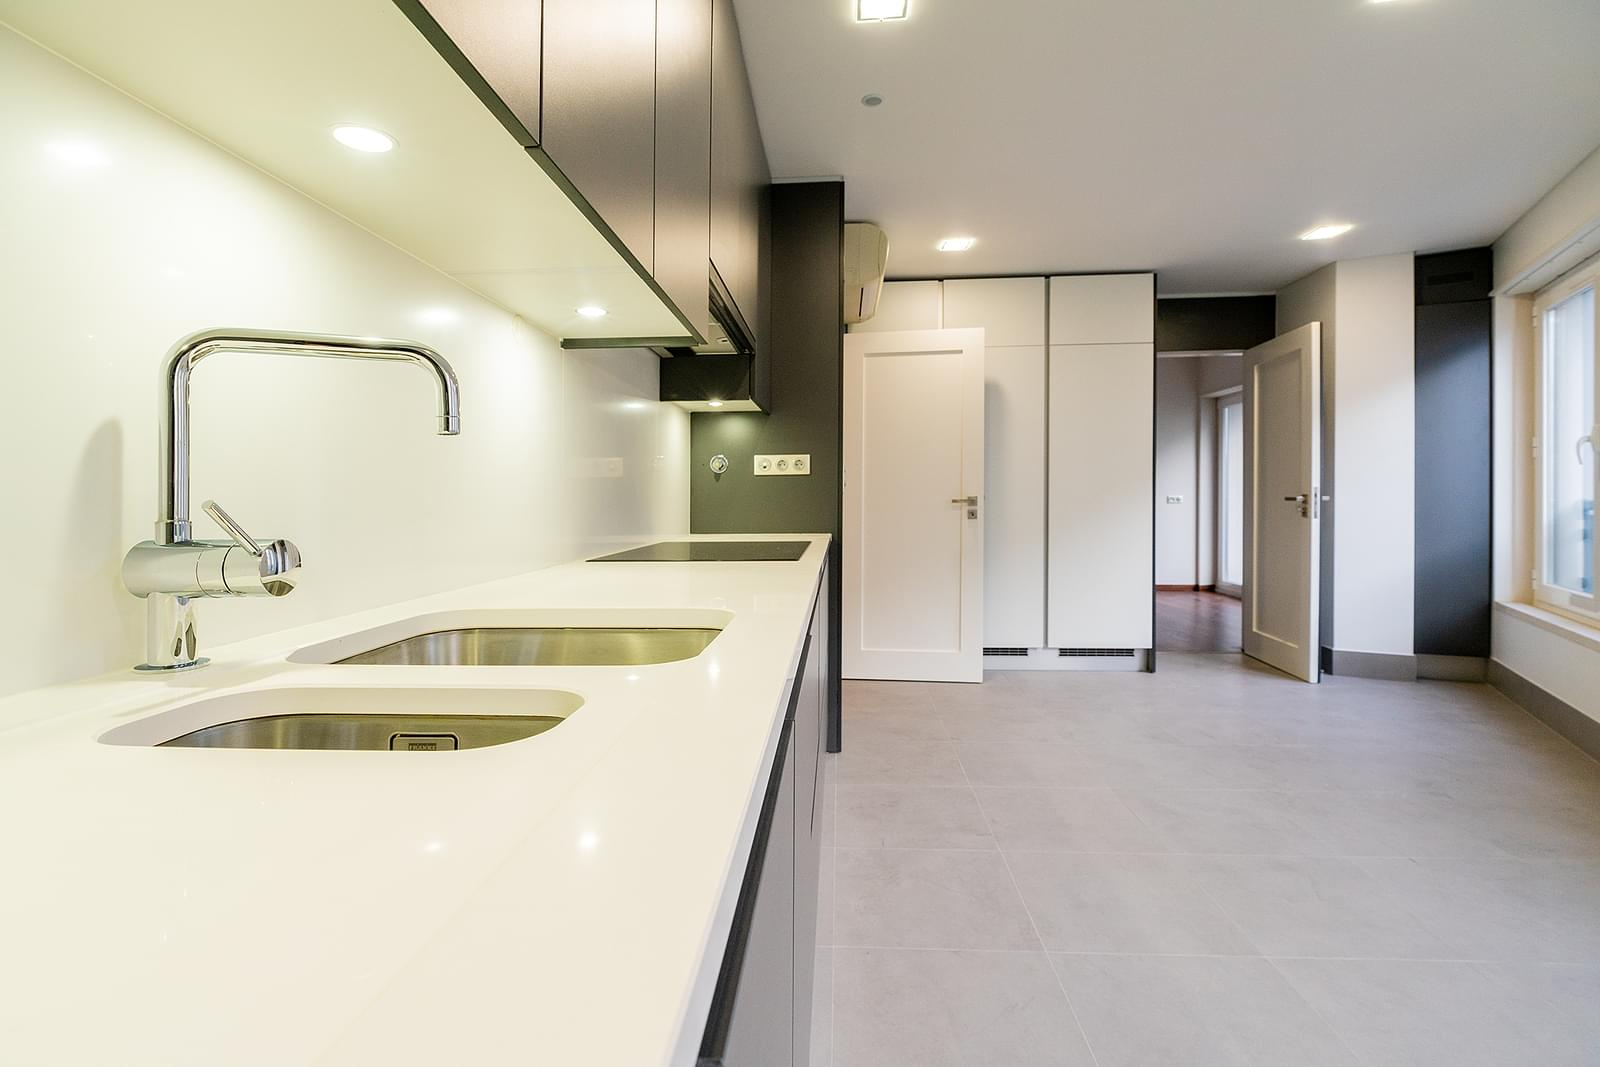 pf18533-apartamento-t4-lisboa-e353c9ca-b14d-4f32-8a41-d9369ceb473a